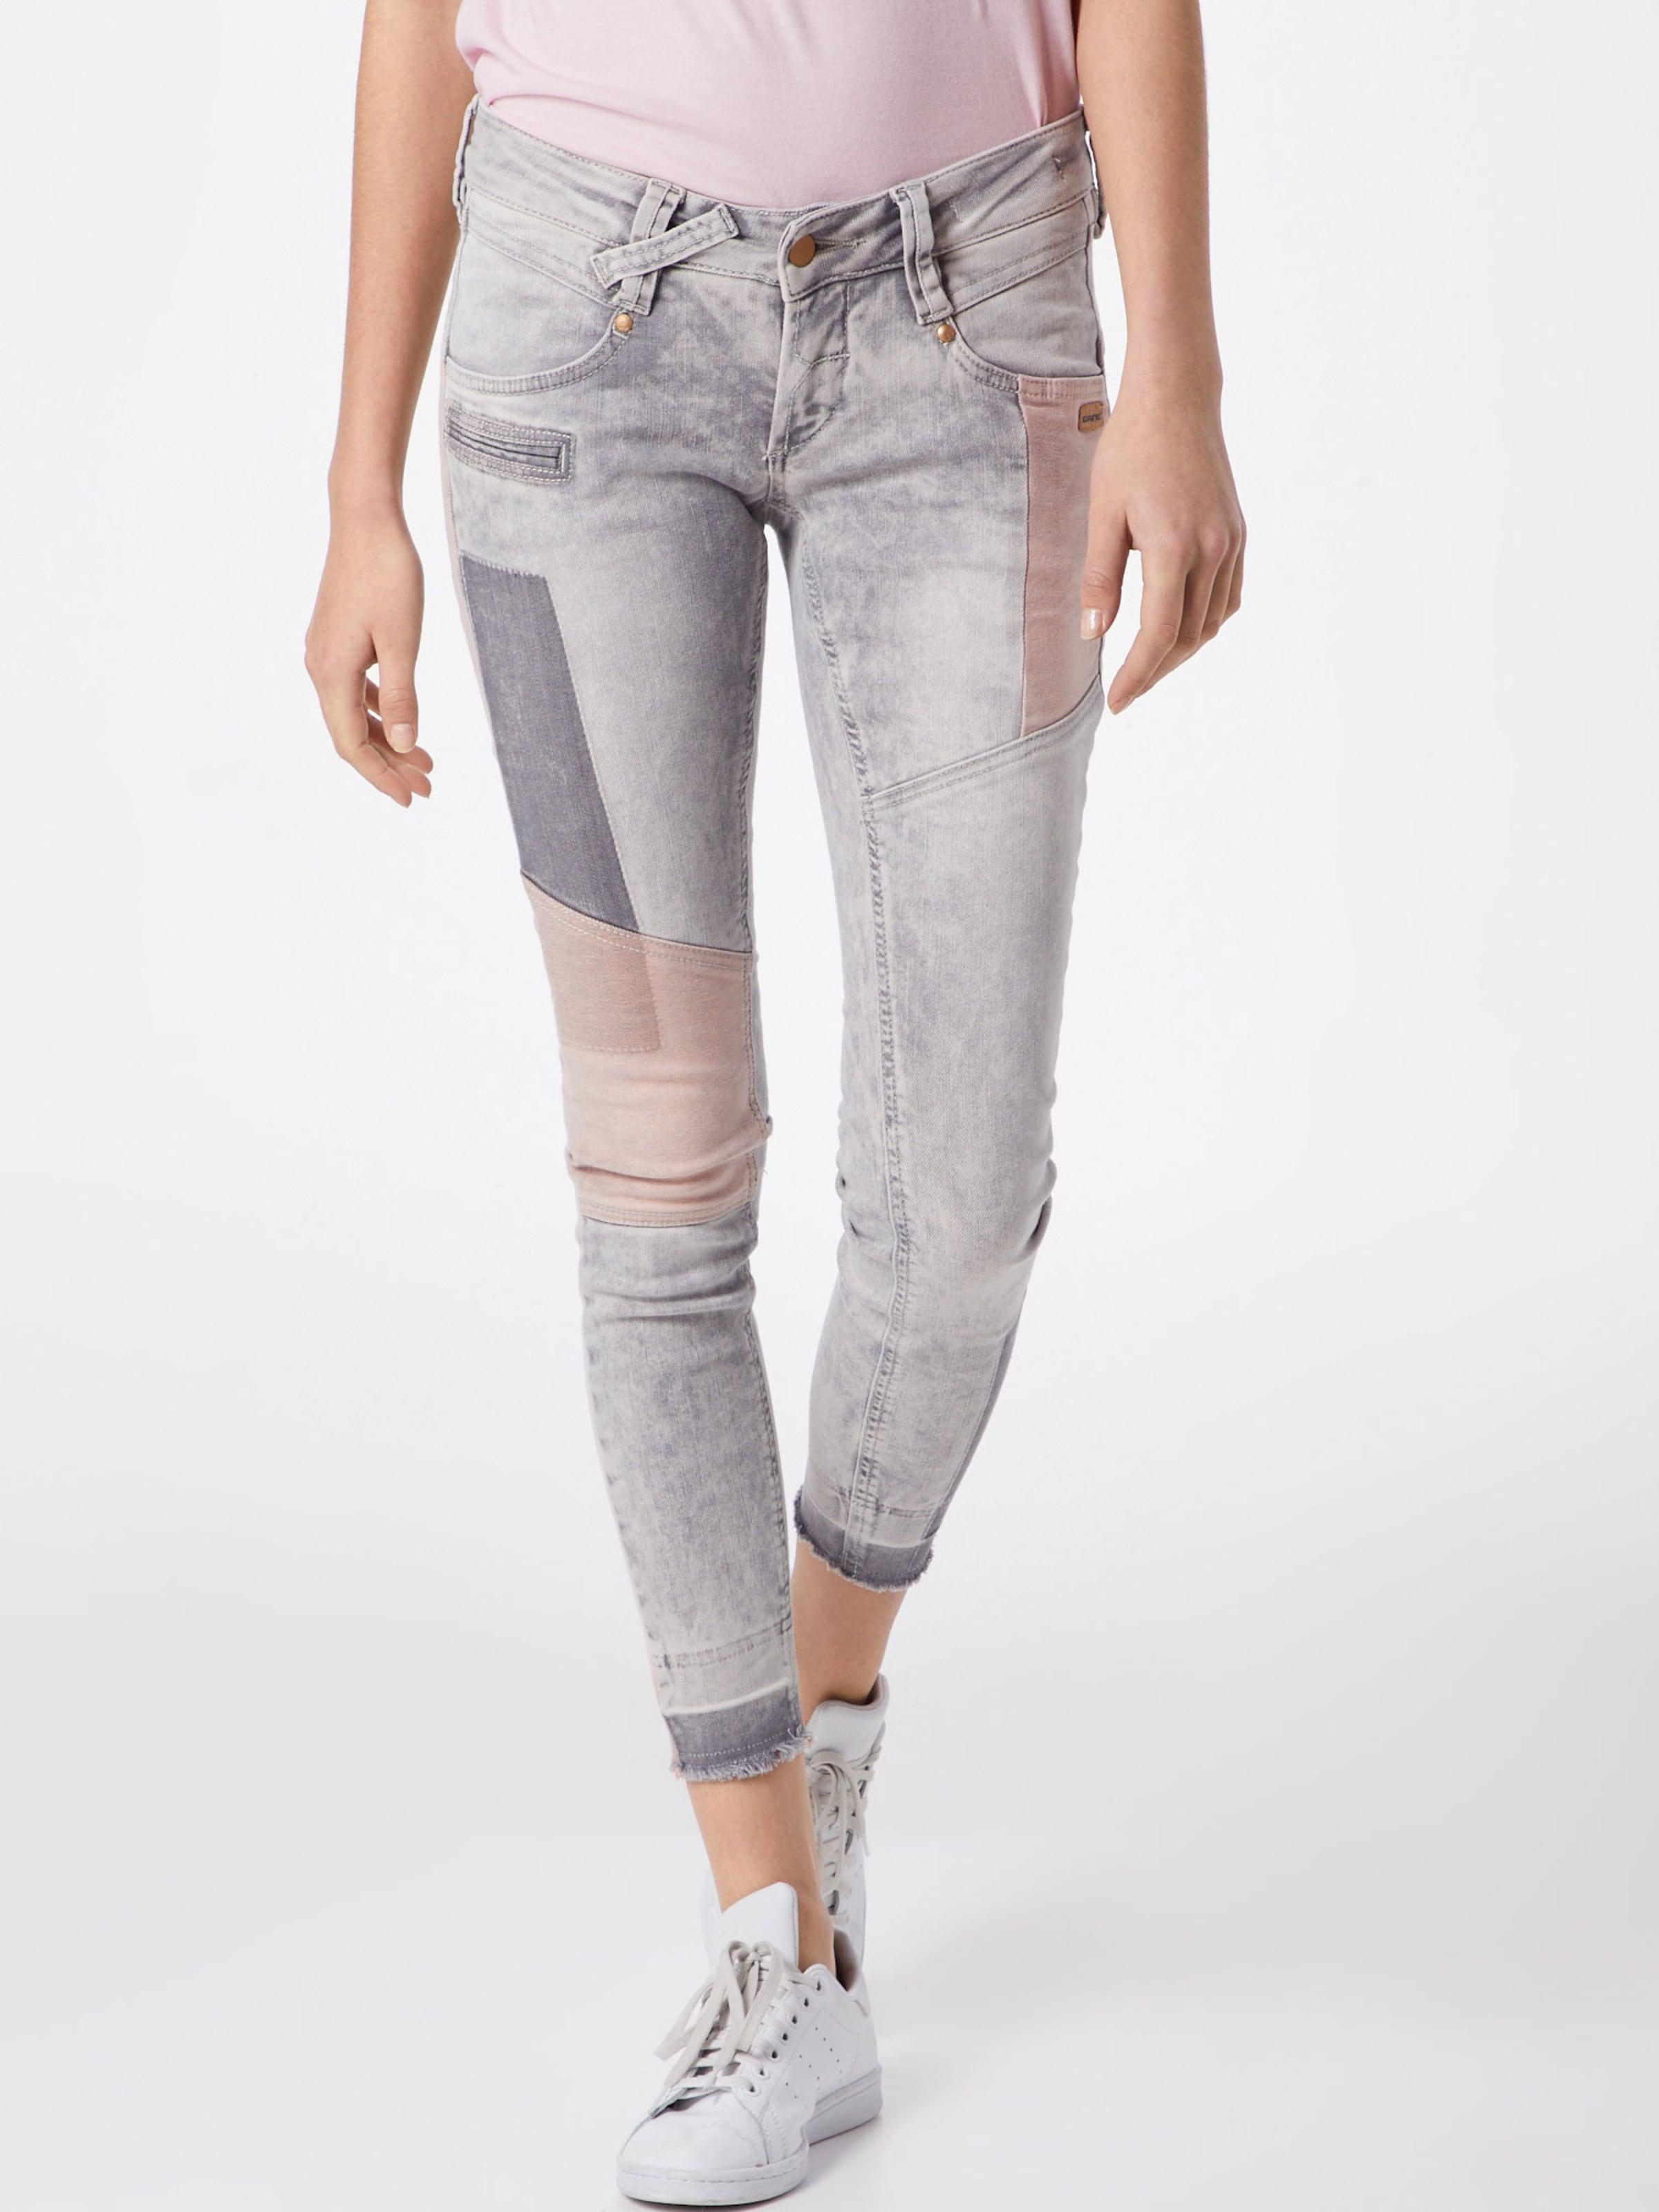 Patchwork' Gang 'nena Pink In Jeans mn0yN8Ovw